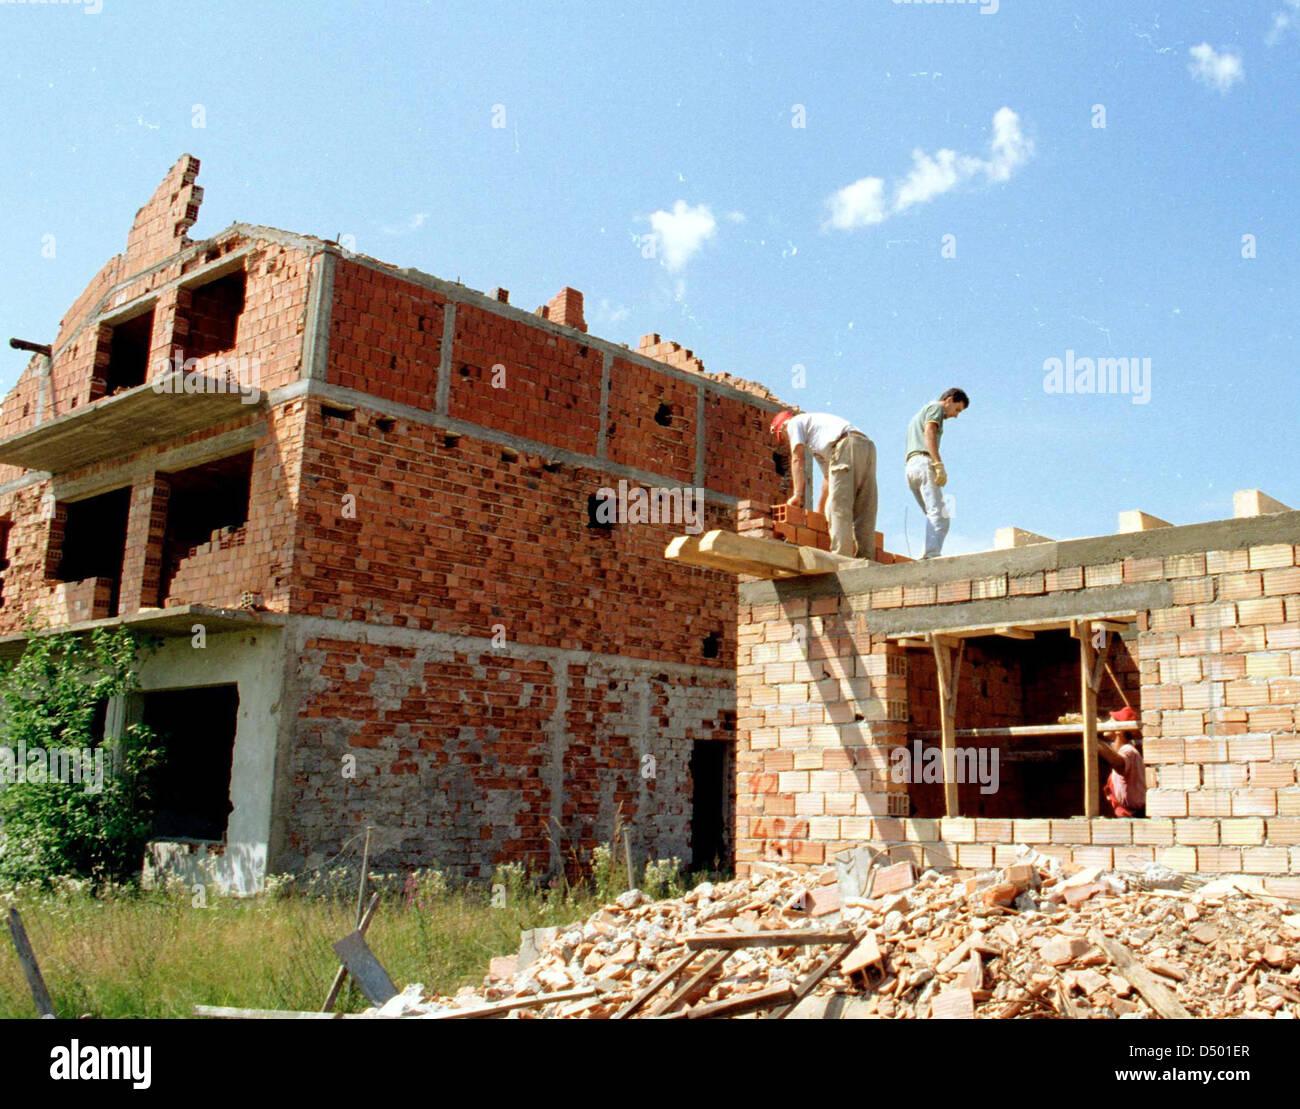 BRCKO, BOSNIA , 08 DECEMBER 1997 ---- Bosnian Moslem men rebuild their home in the contested Bosnian city of Brcko. - Stock Image